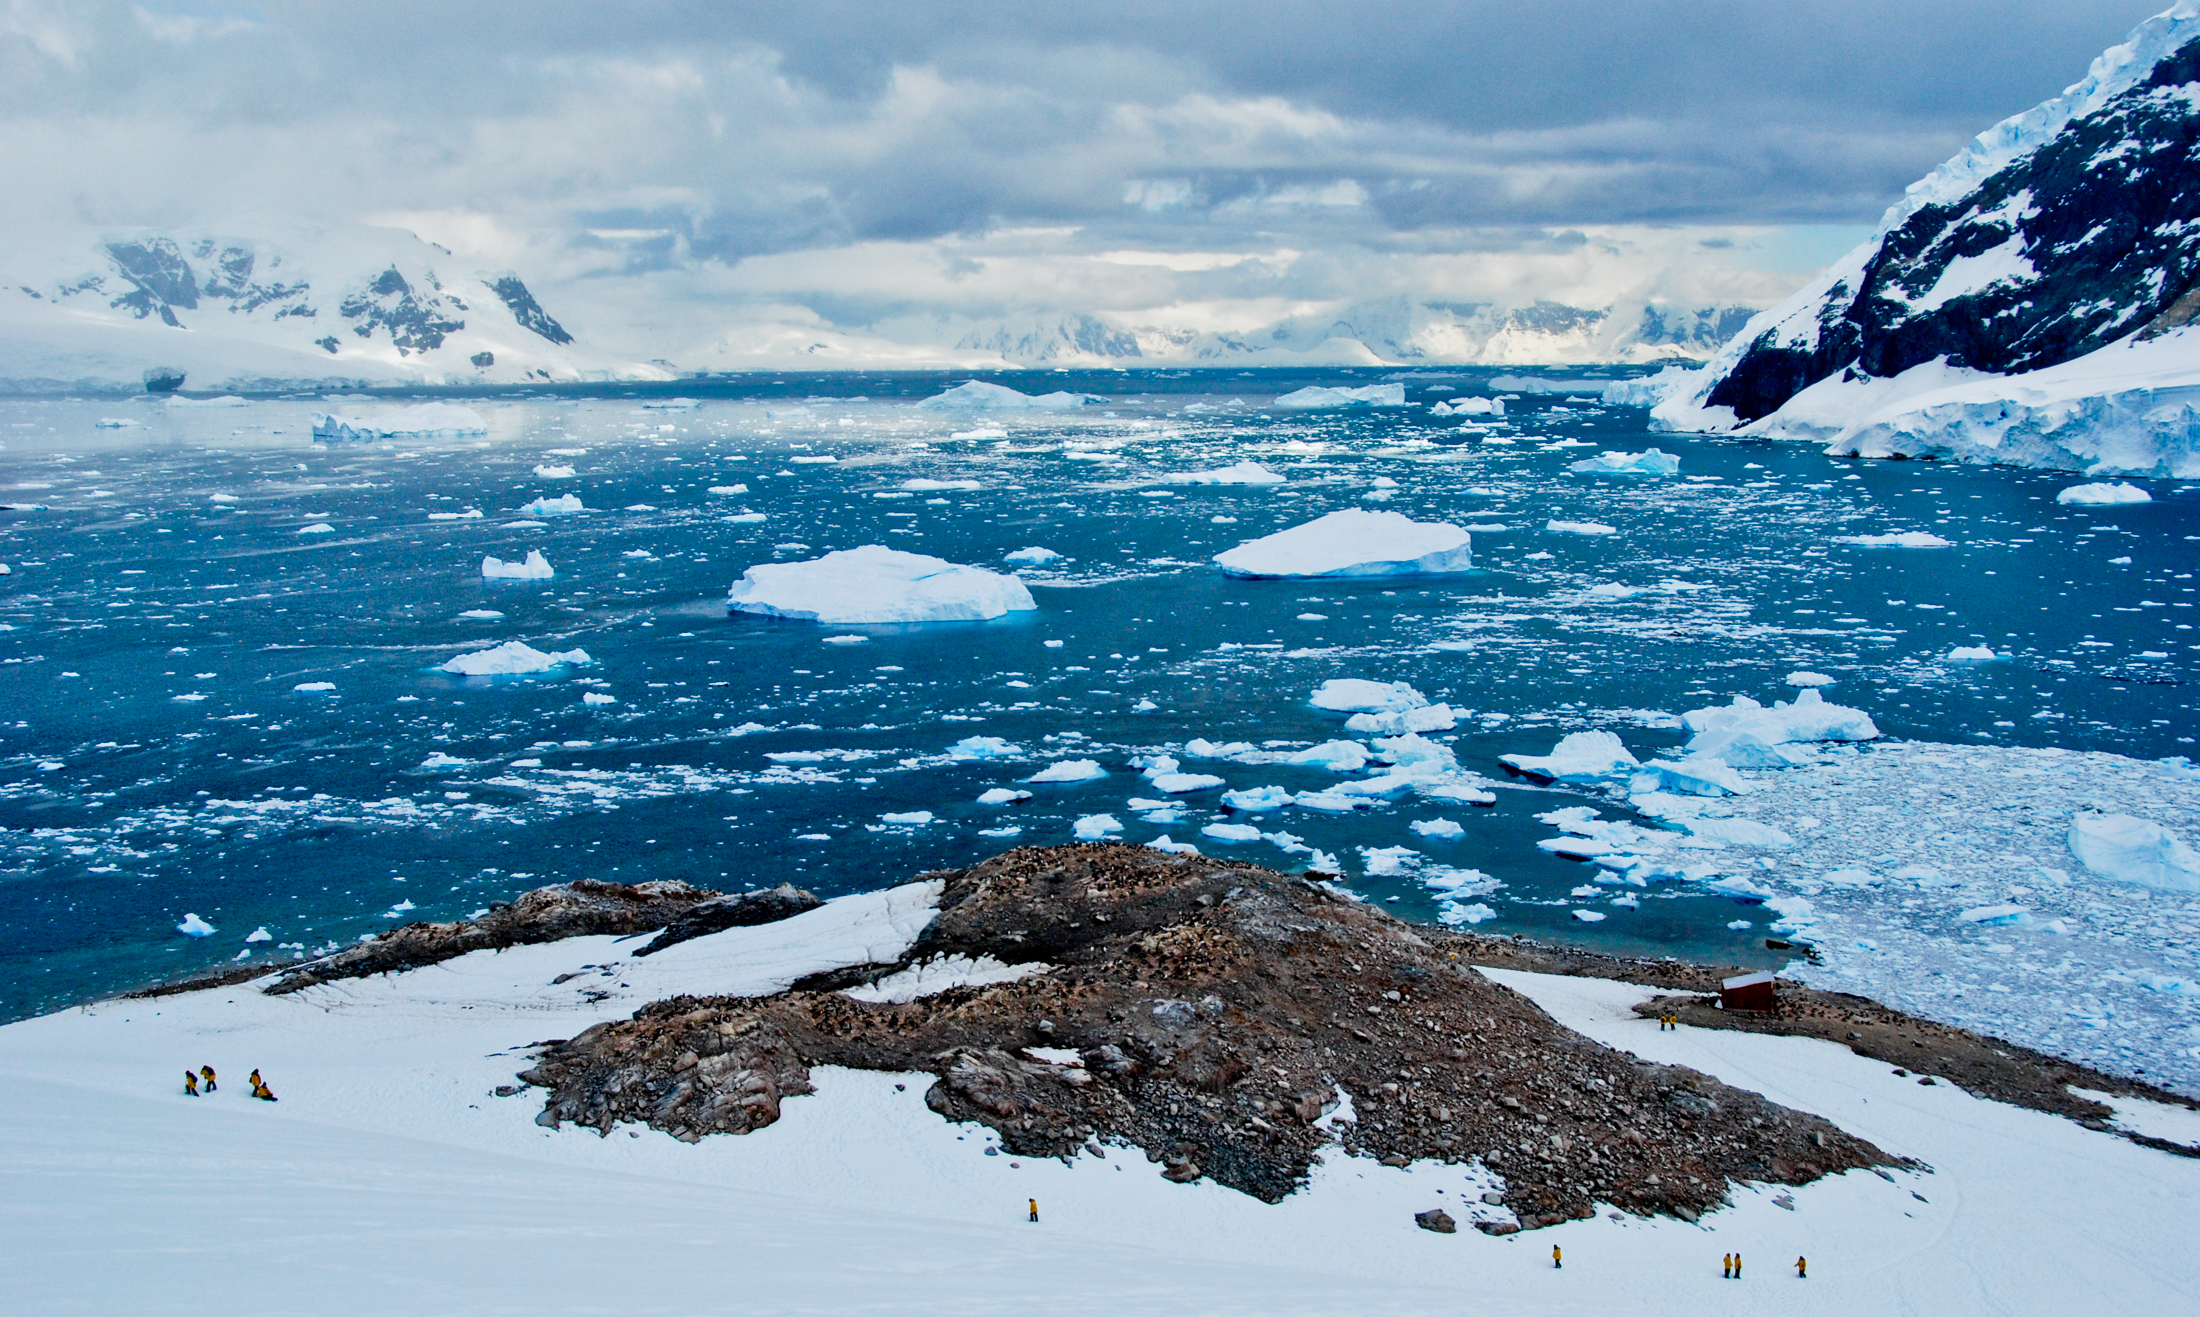 Julie-Jira_2015_PS_Antarctica-7.jpg